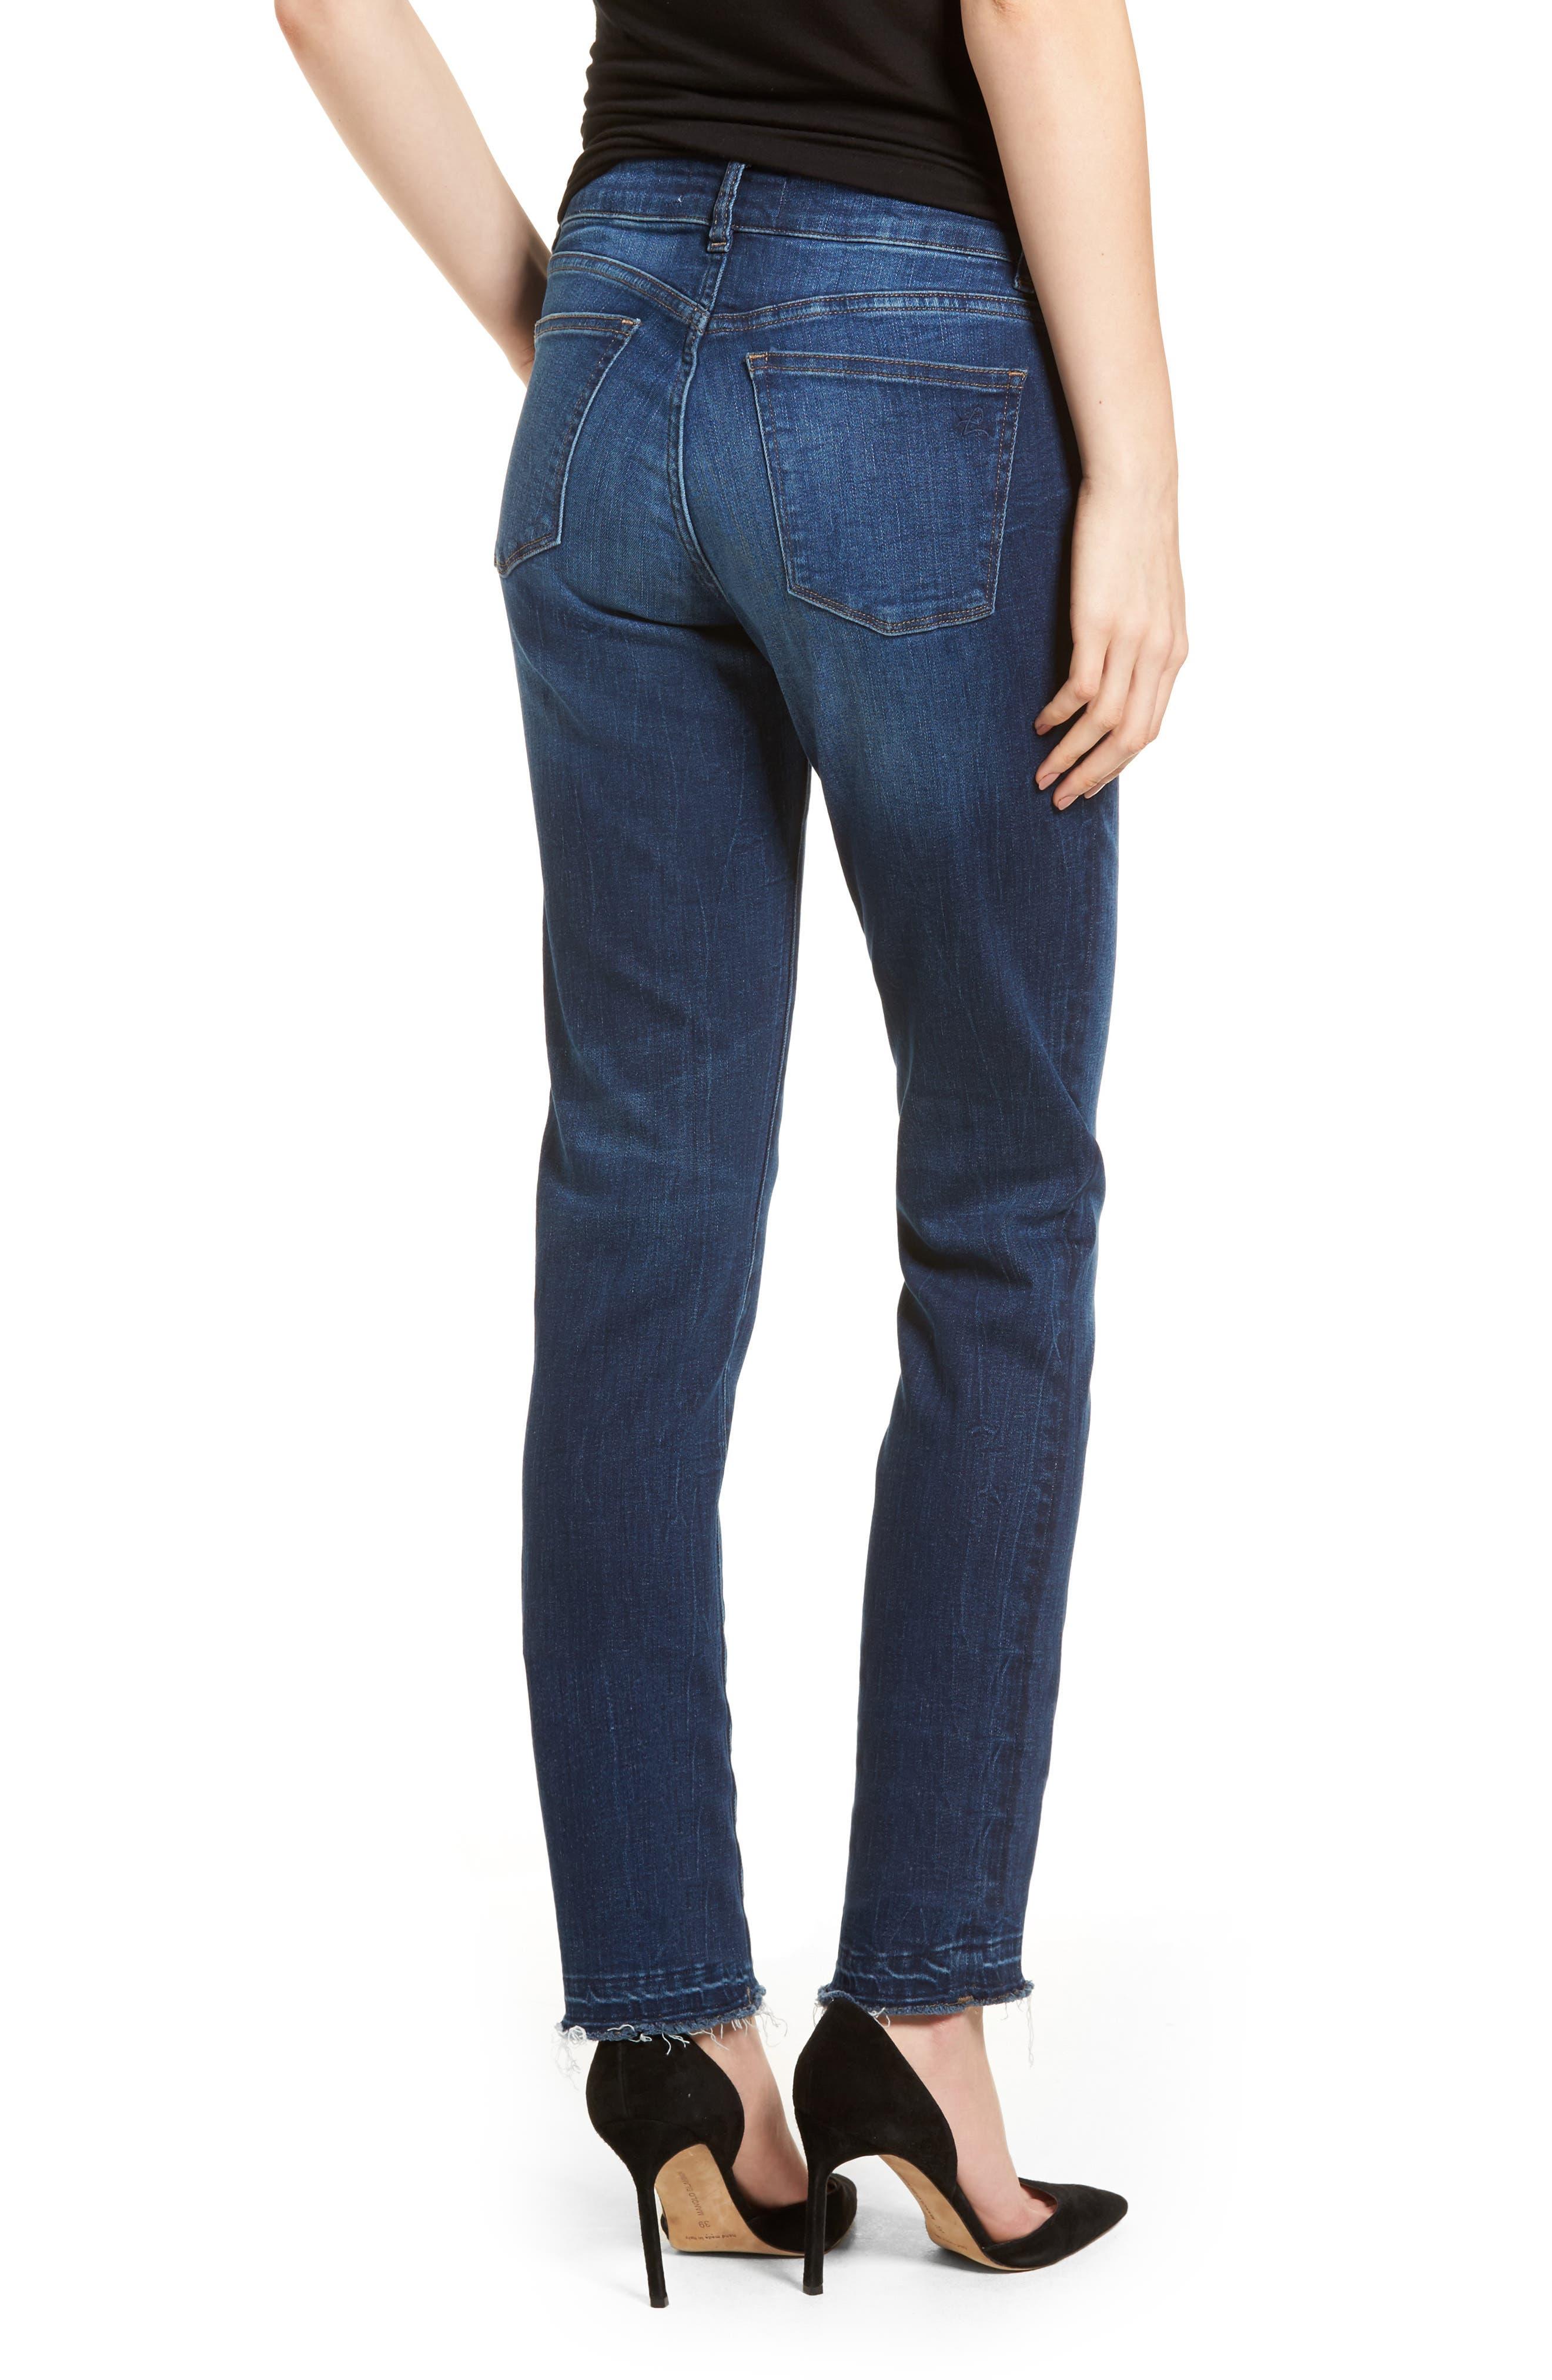 Coco Curvy Slim Straight Leg Jeans,                             Alternate thumbnail 2, color,                             405